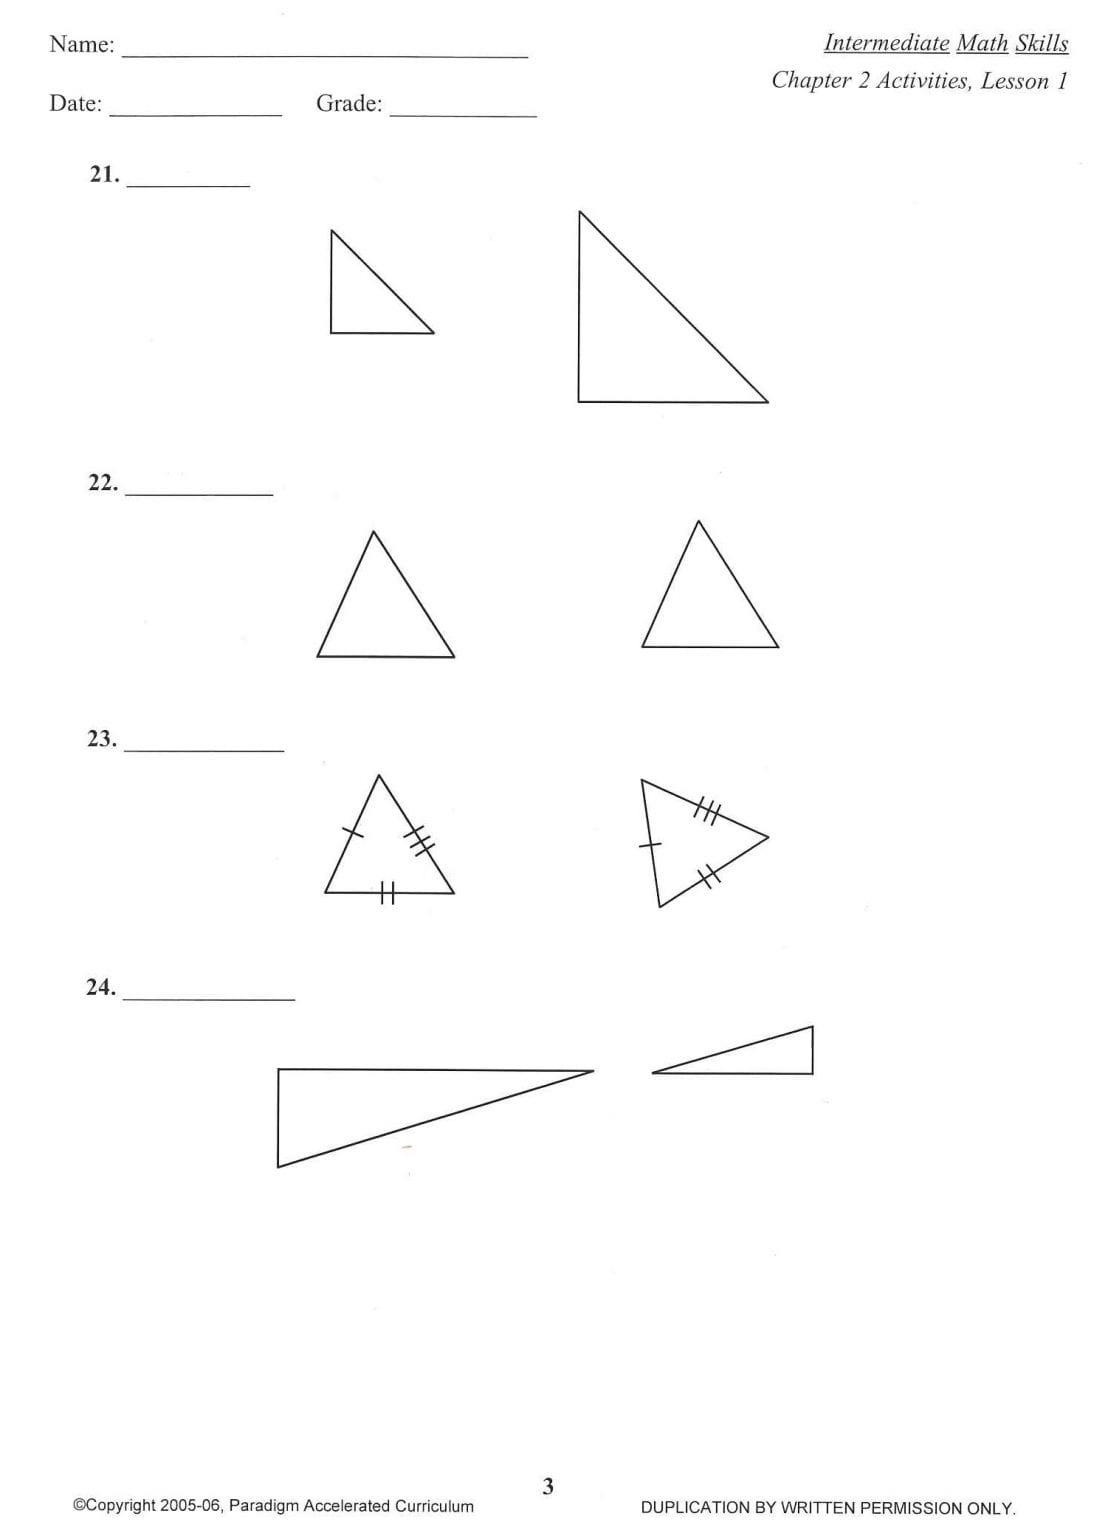 Sale On Intermediate Math Skills Chapter 2 Activities